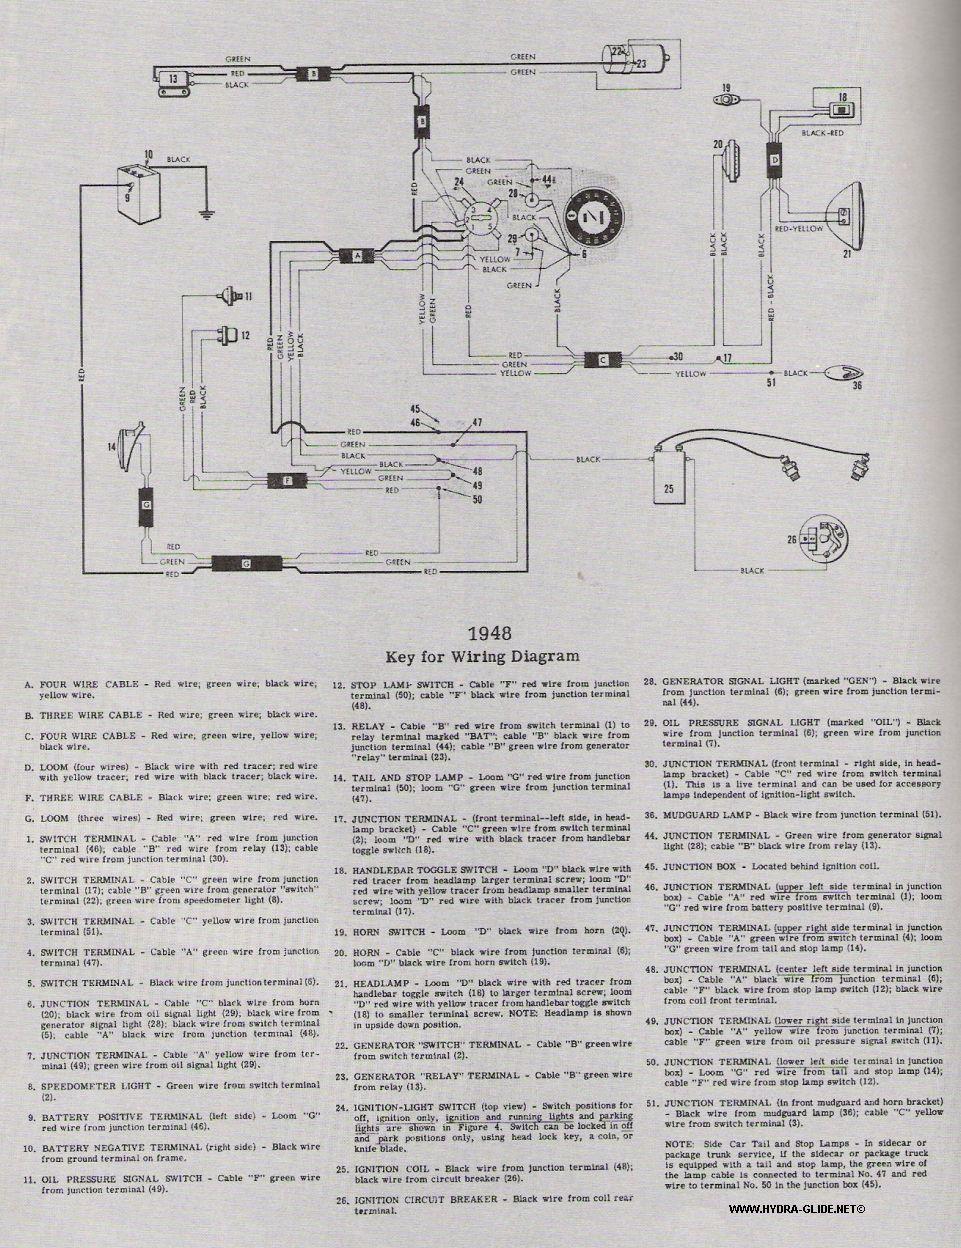 cycle electrics panhead wiring diagram 93575 panhead wiring diagram digital resources  93575 panhead wiring diagram digital